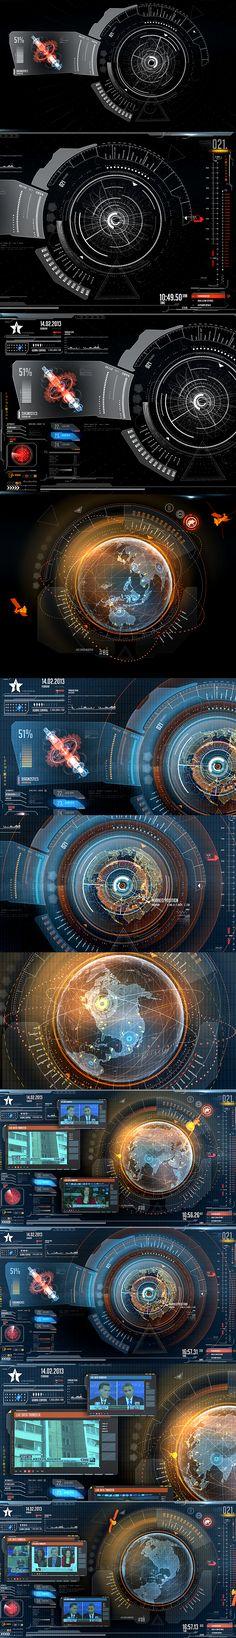 2RISE - FUTURE INTERFACE by ~Jedi88